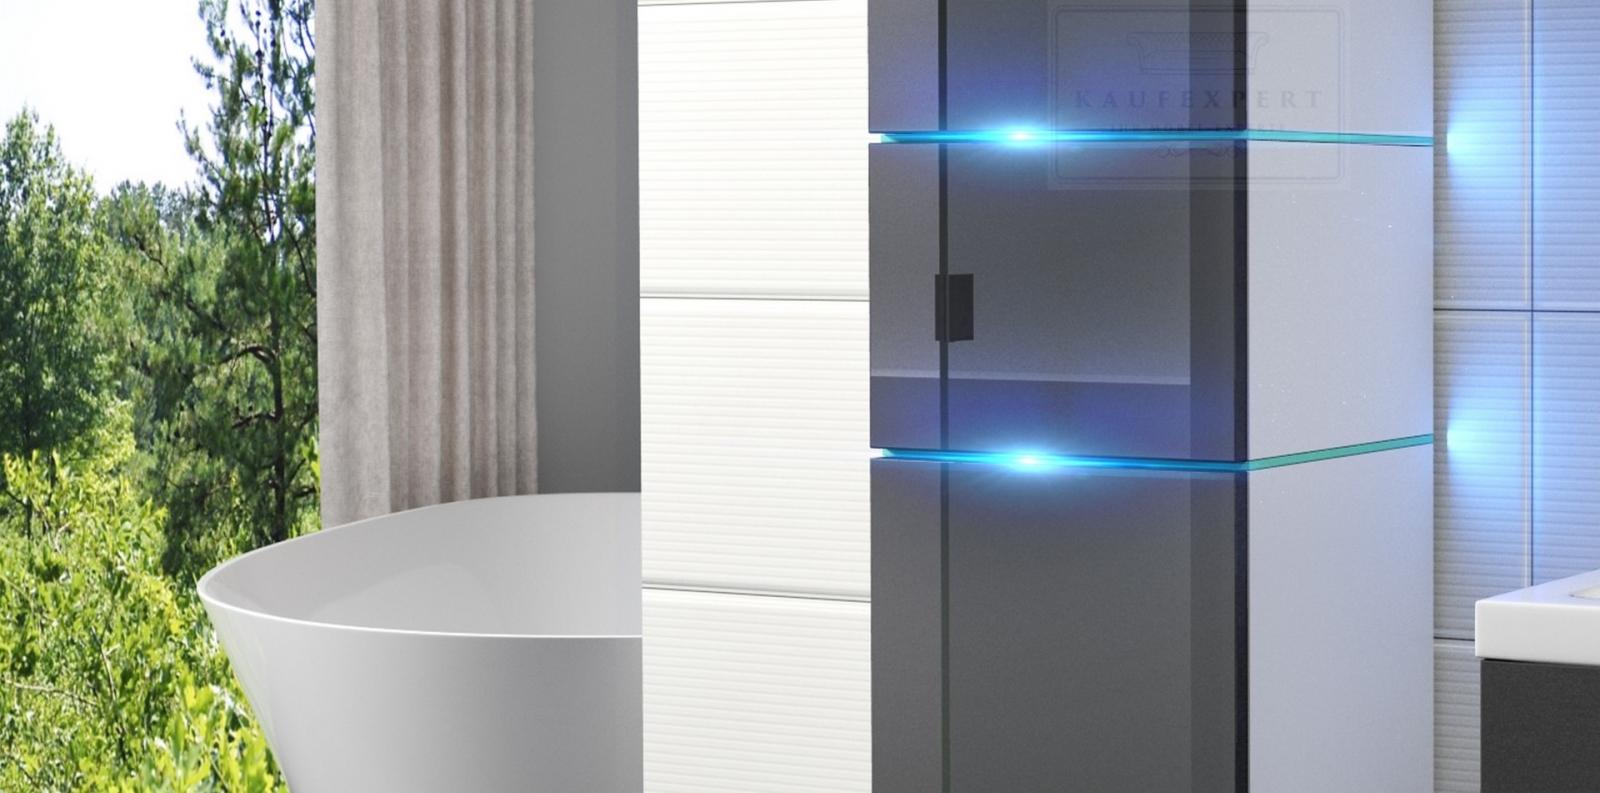 kaufexpert badm bel set ledox 170 cm grau hochglanz wei. Black Bedroom Furniture Sets. Home Design Ideas